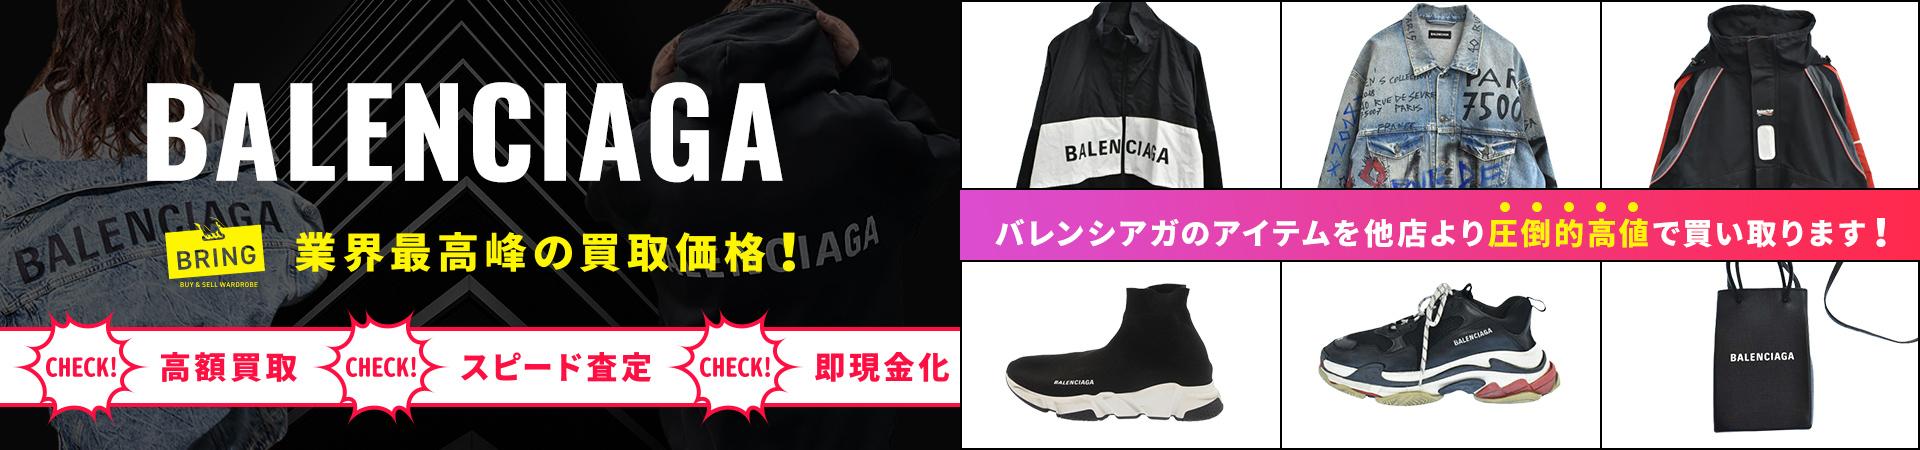 Balenciaga(バレンシアガ) 買取強化中